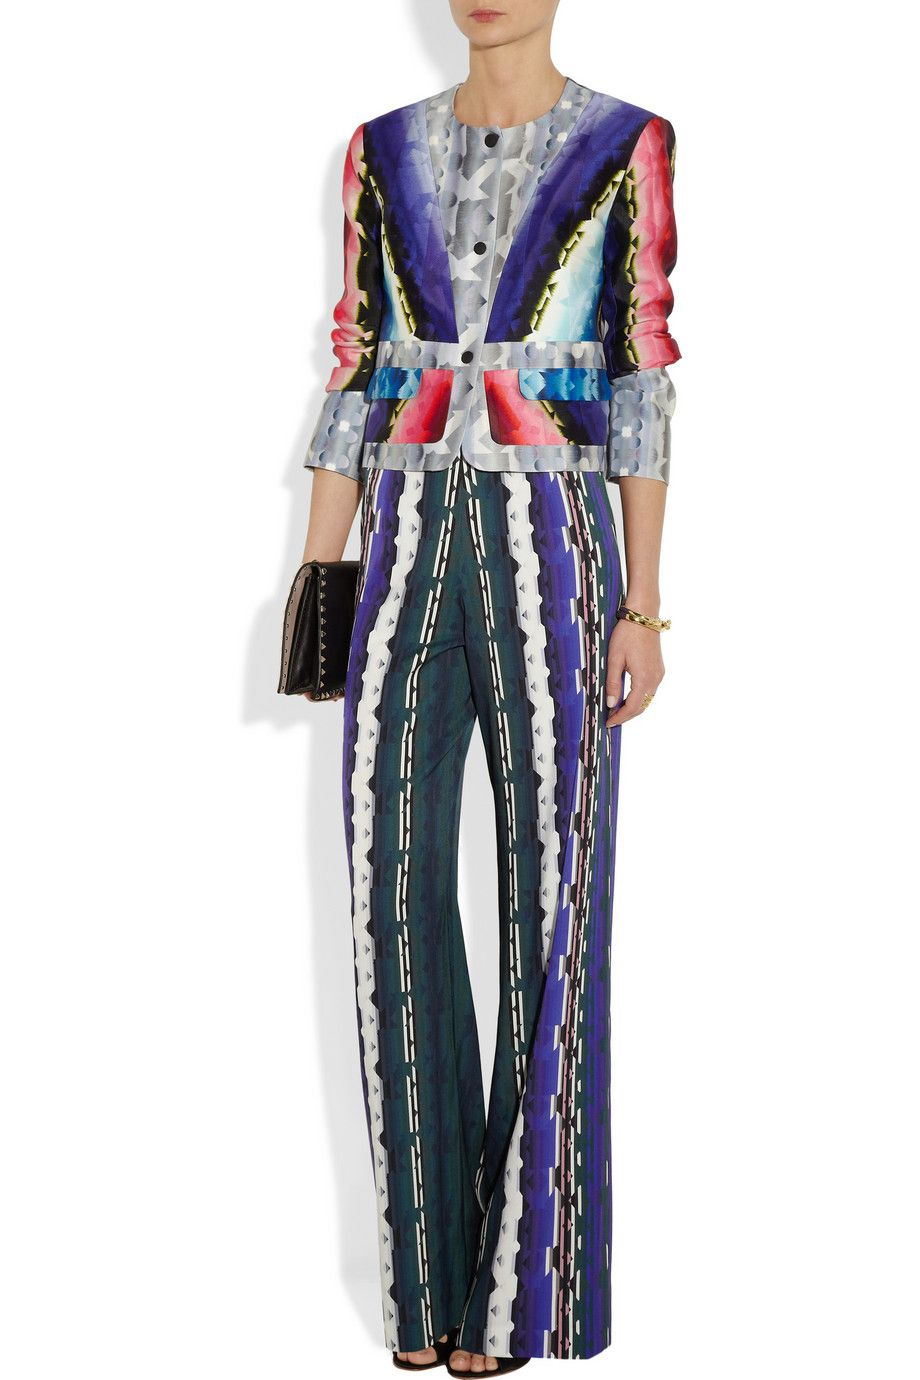 Peter Pilotto|Printed stretch-silk wide-leg pants|NET-A-PORTER.COM